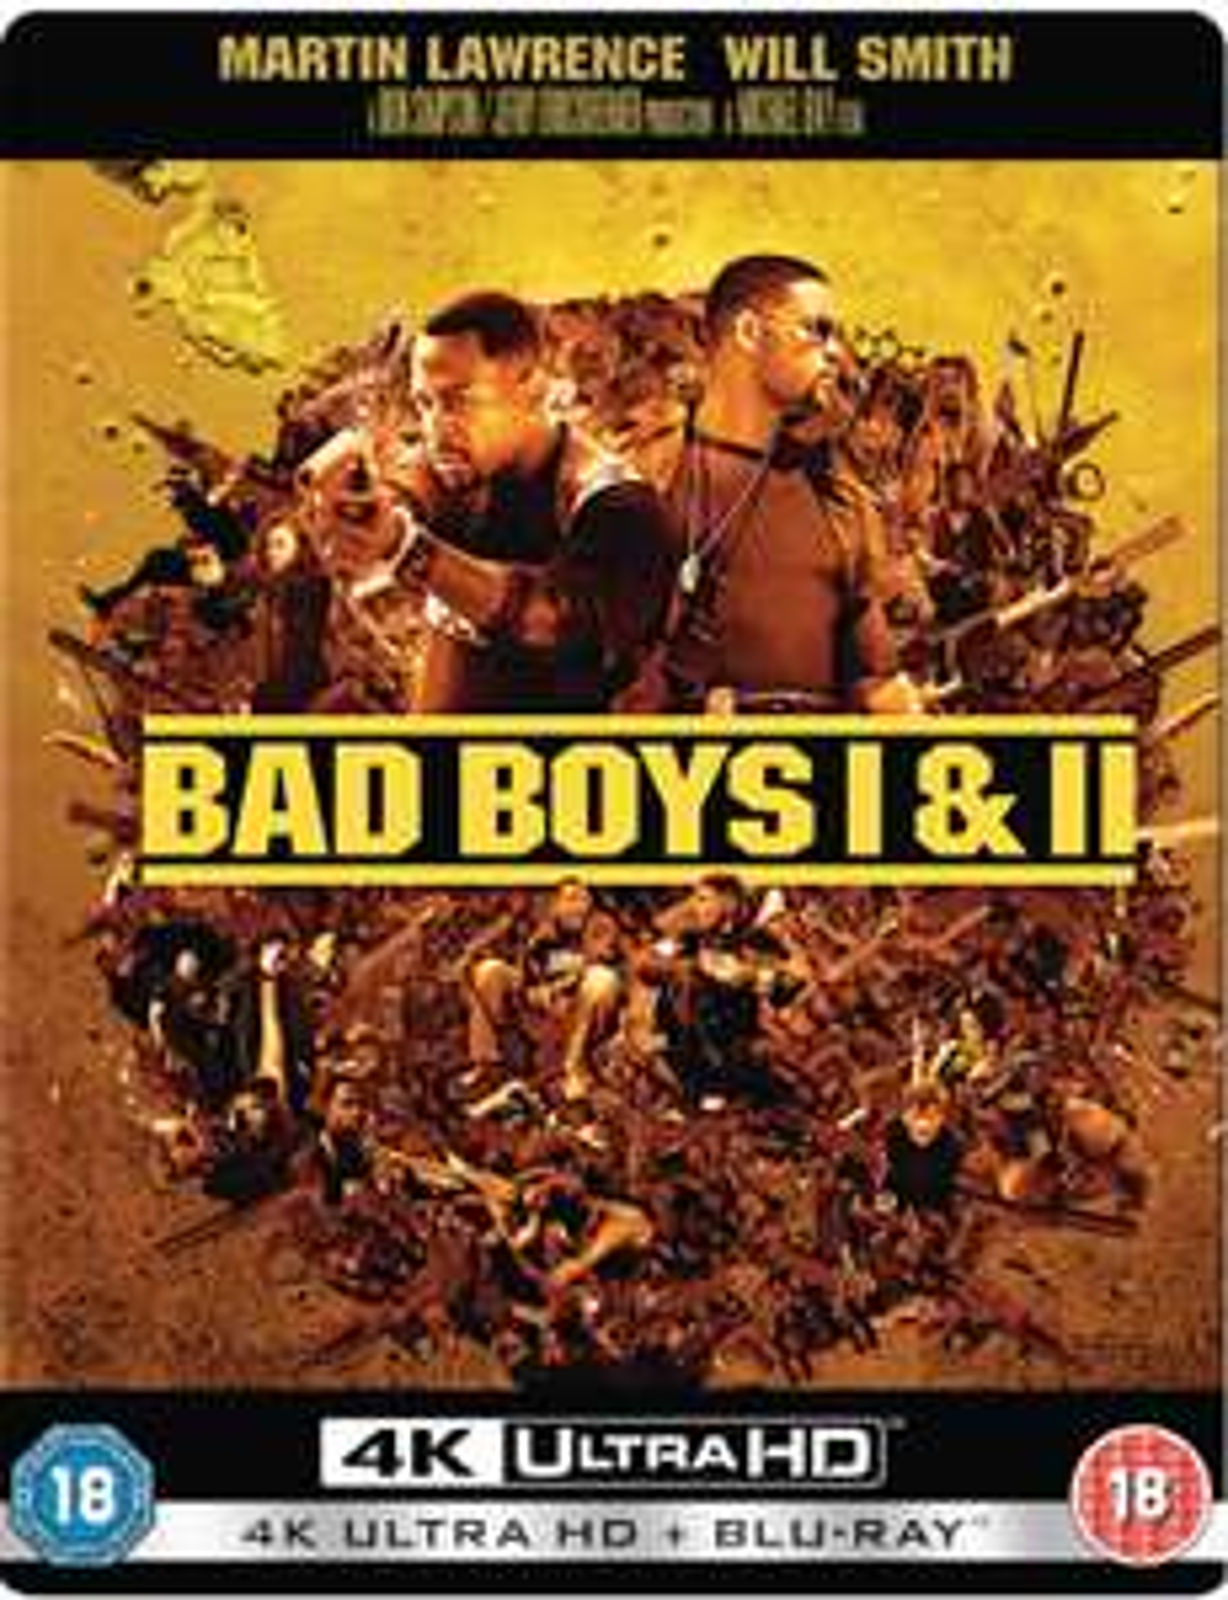 Bad Boys I&II Collection 4K Ultra HD  Blu Ray – Zavvi Exclusive Pop Art Steelbook £19.99 @ zavvi